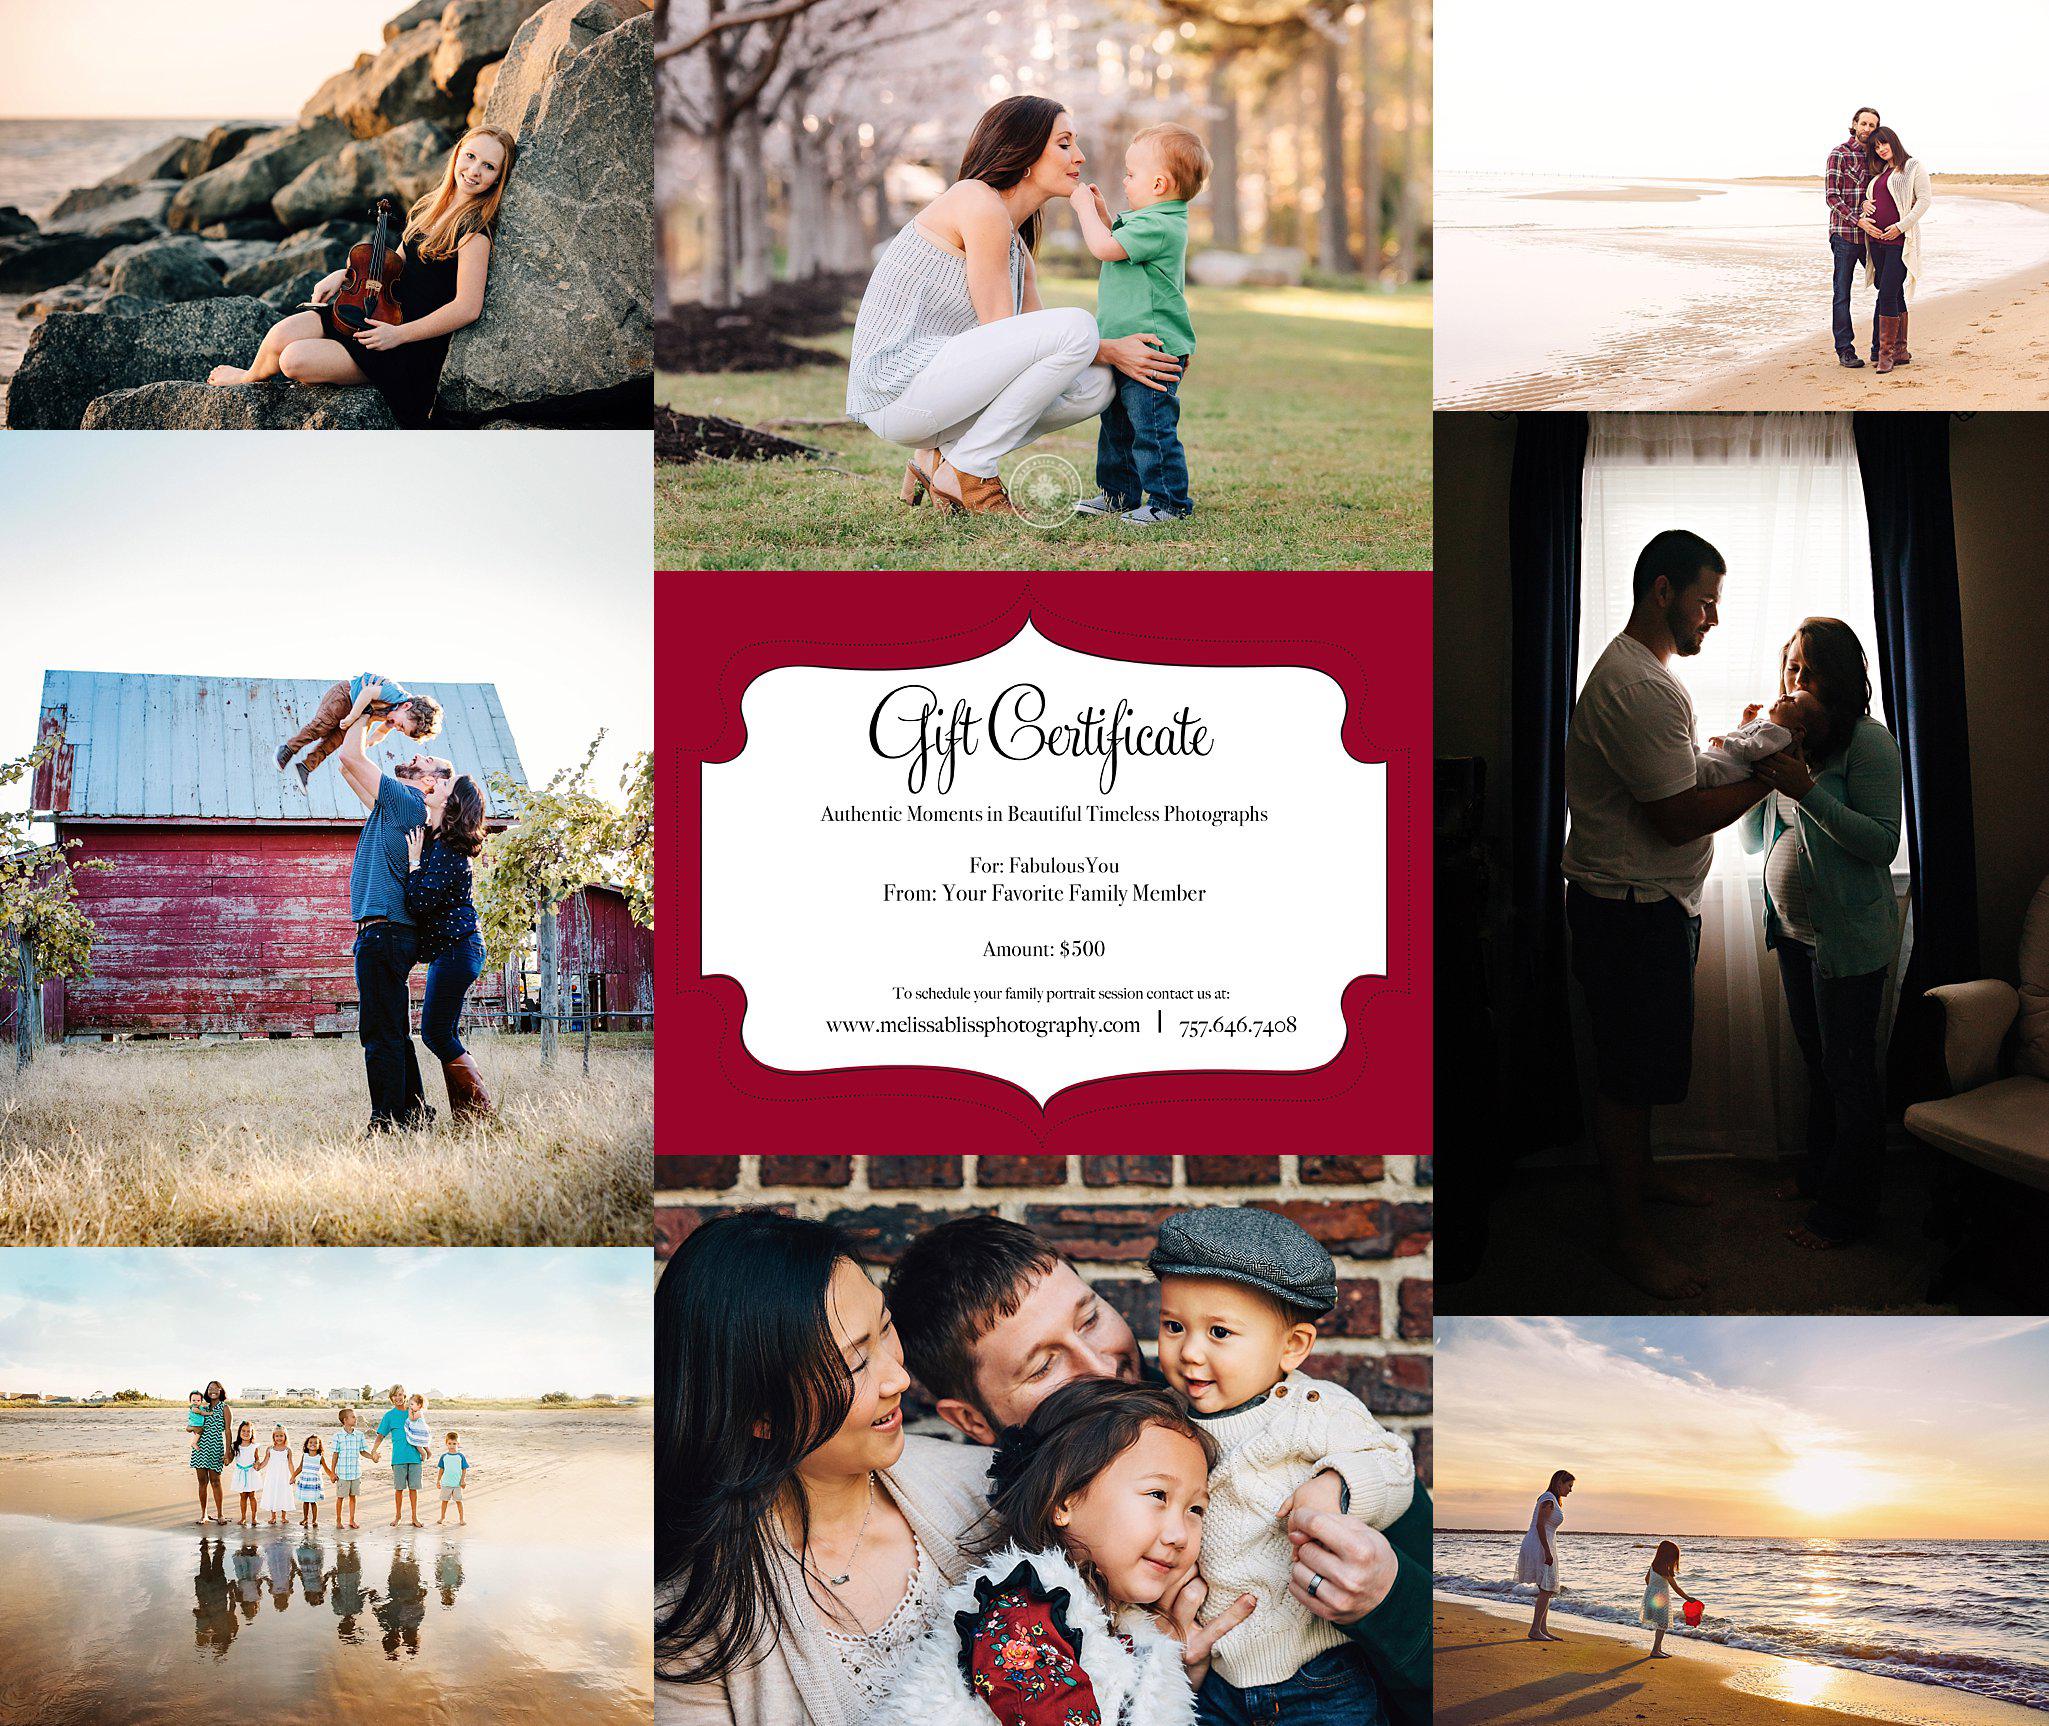 virginia-beach-norfolk-chesapeake-suffolk-williamsburg-sandbridge-family-engagement-newborn-lifestyle-documentary-photographer-gift-certificate-sale-photo-shoot-photo-sessions-hampton-roads-photography-melissa-bliss-photography